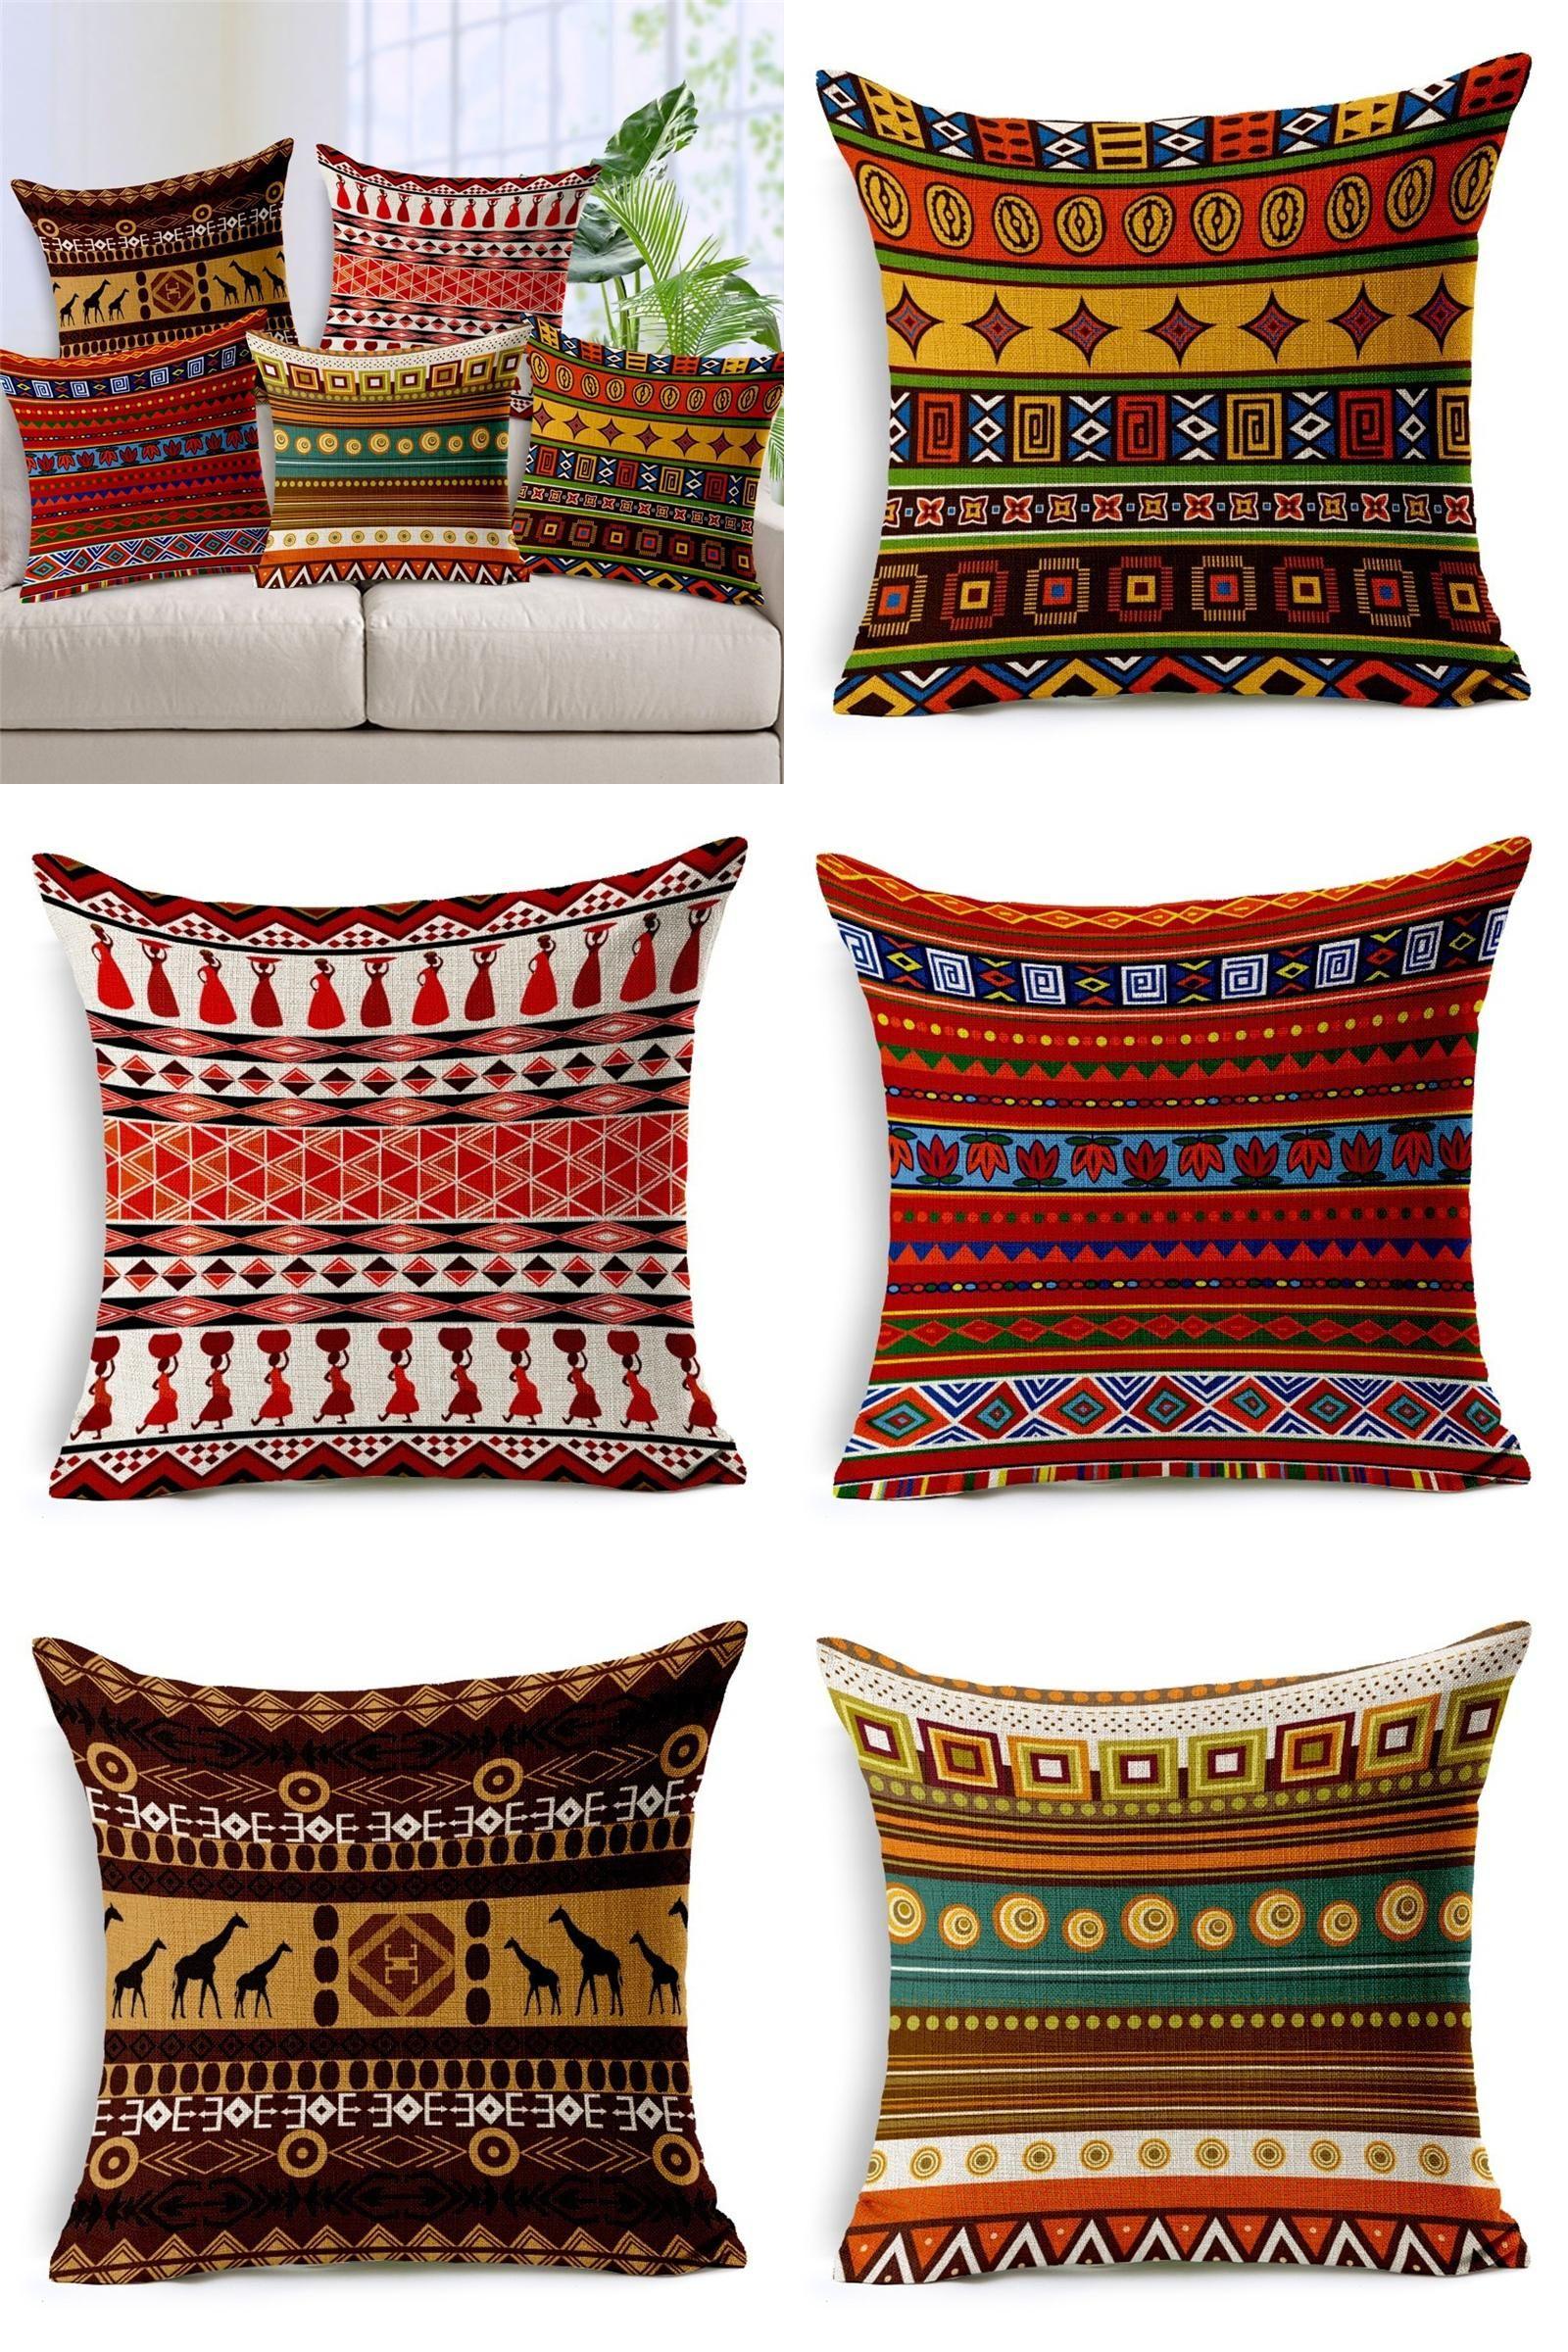 Visit to buy real capa de almofada decorative pillows bohemian